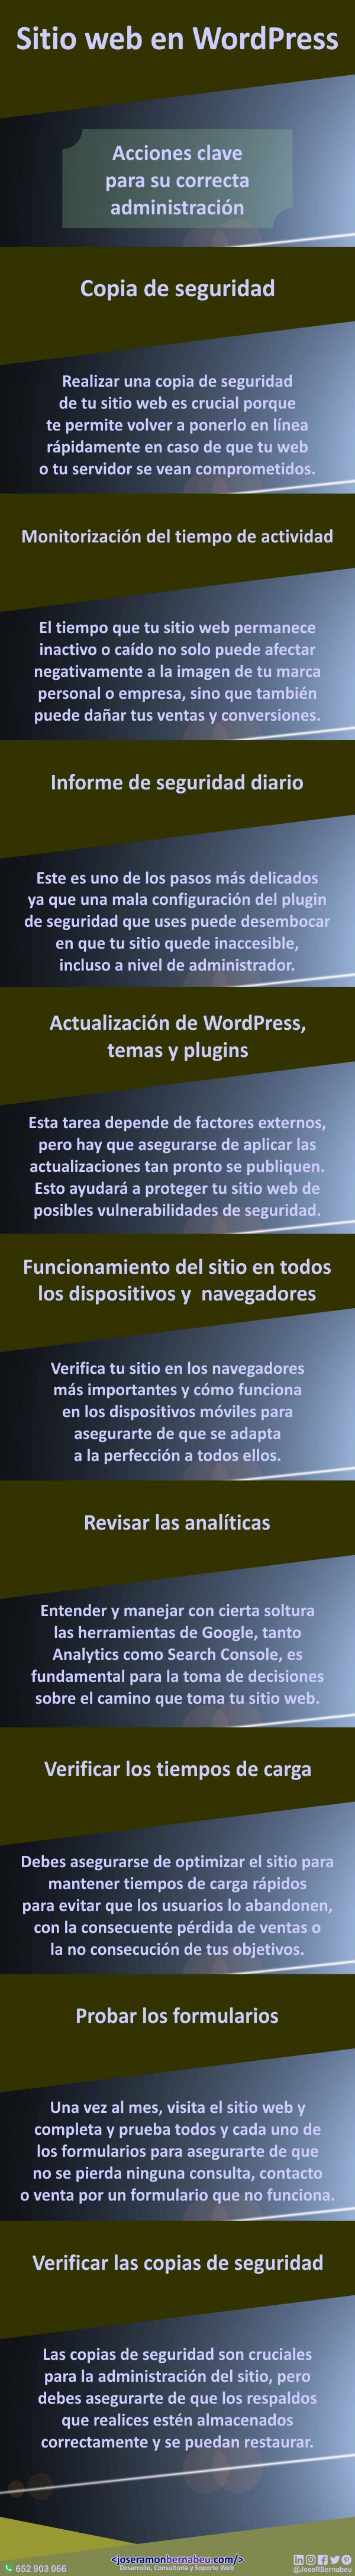 Infografía - Administrar web en WordPress